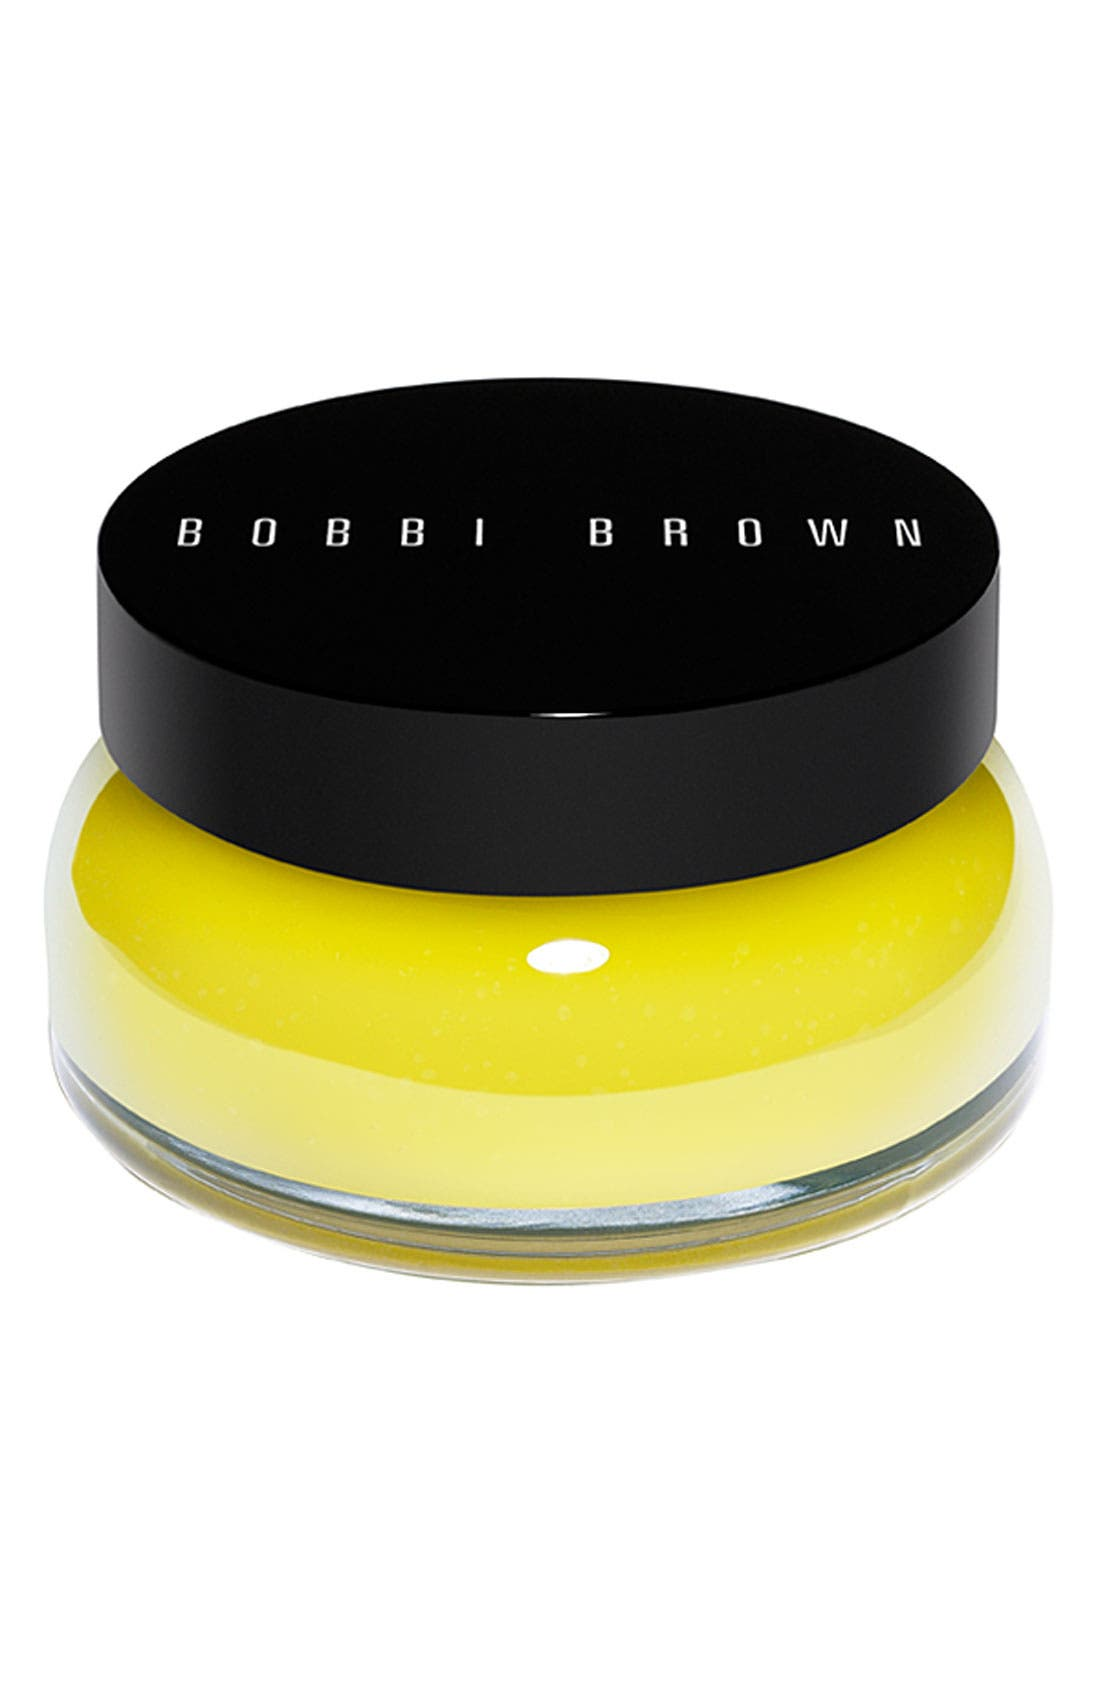 BOBBI BROWN,                             Extra Balm Rinse,                             Main thumbnail 1, color,                             NO COLOR